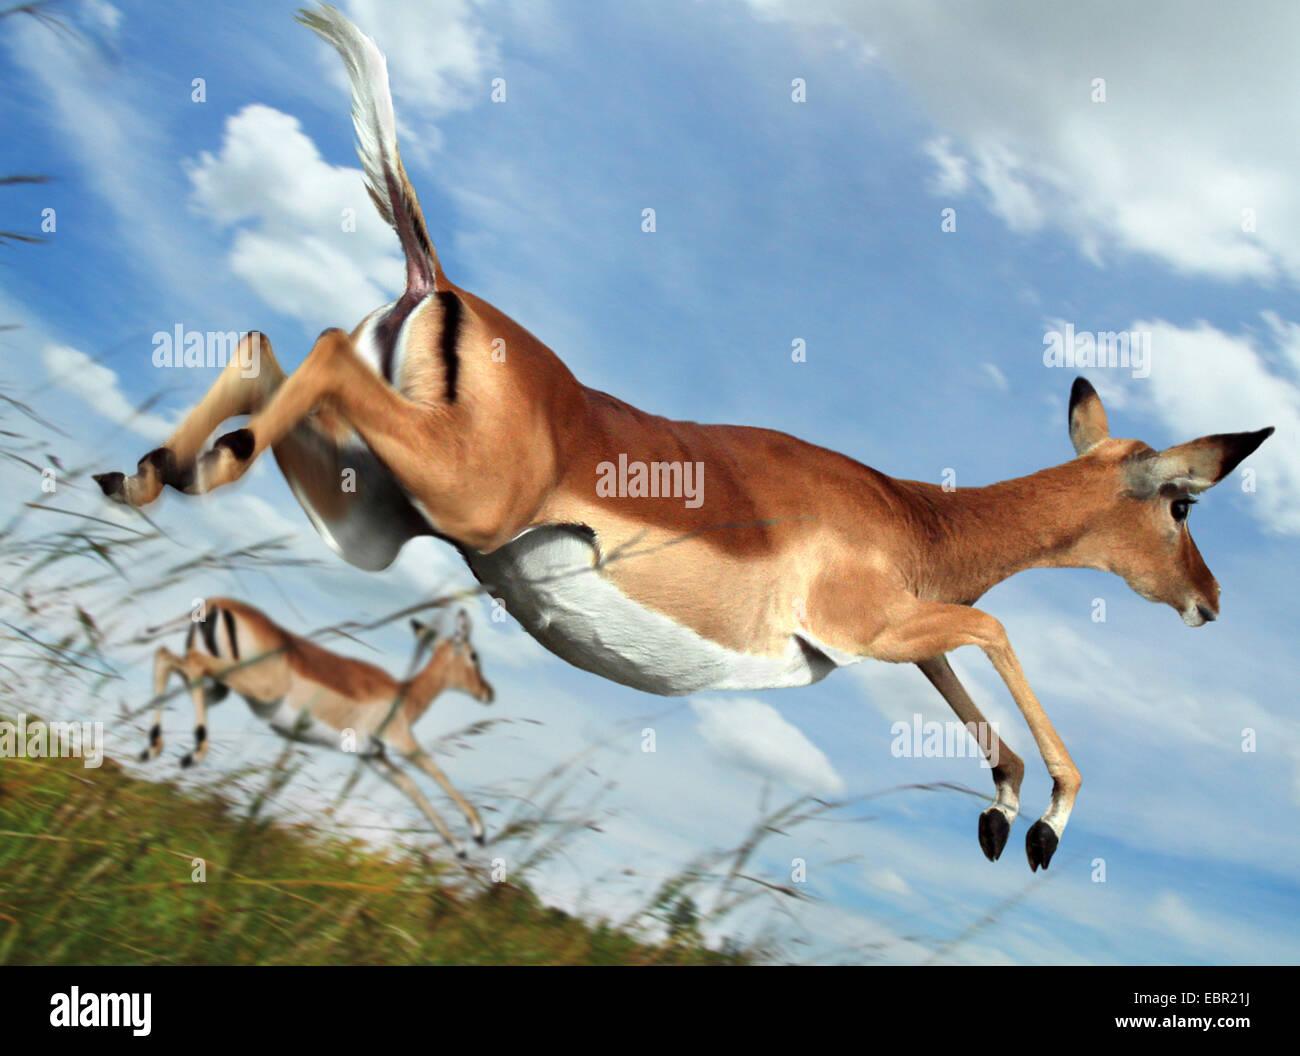 Impala (Aepyceros melampus), sauter en vol, Kenya, Masai Mara National Park Photo Stock